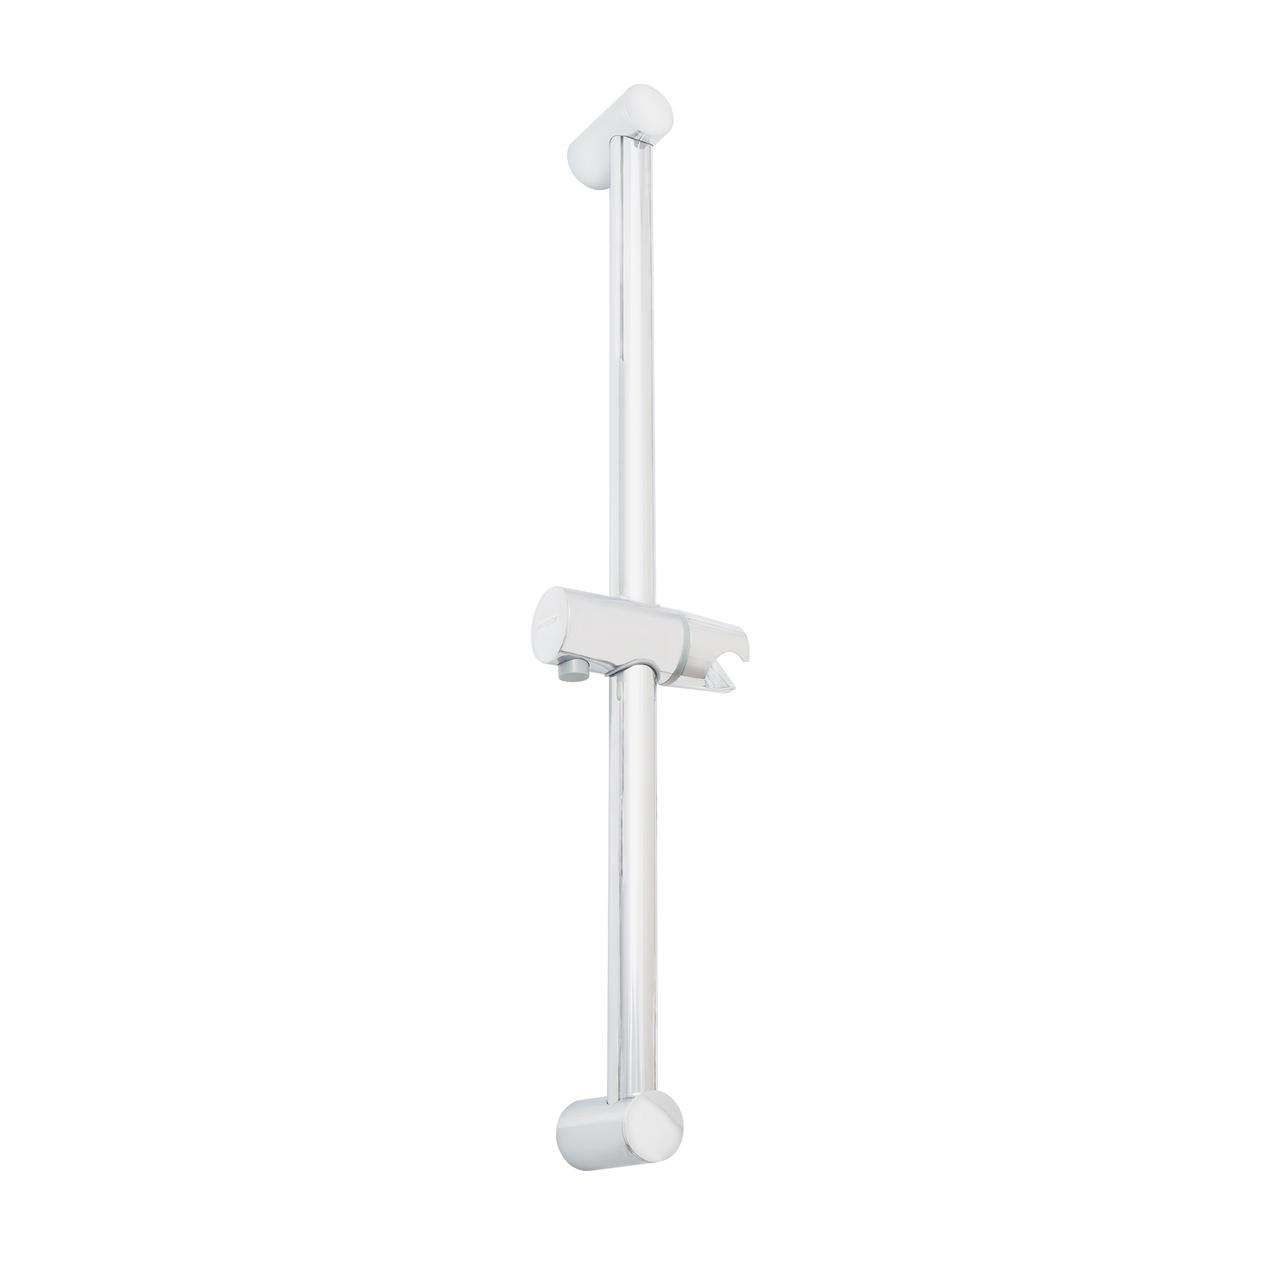 Dyconn Faucet Wb302 Chr Hand Shower Slide Bar With Height Adjustable Sprayer Holder Polished Chrome